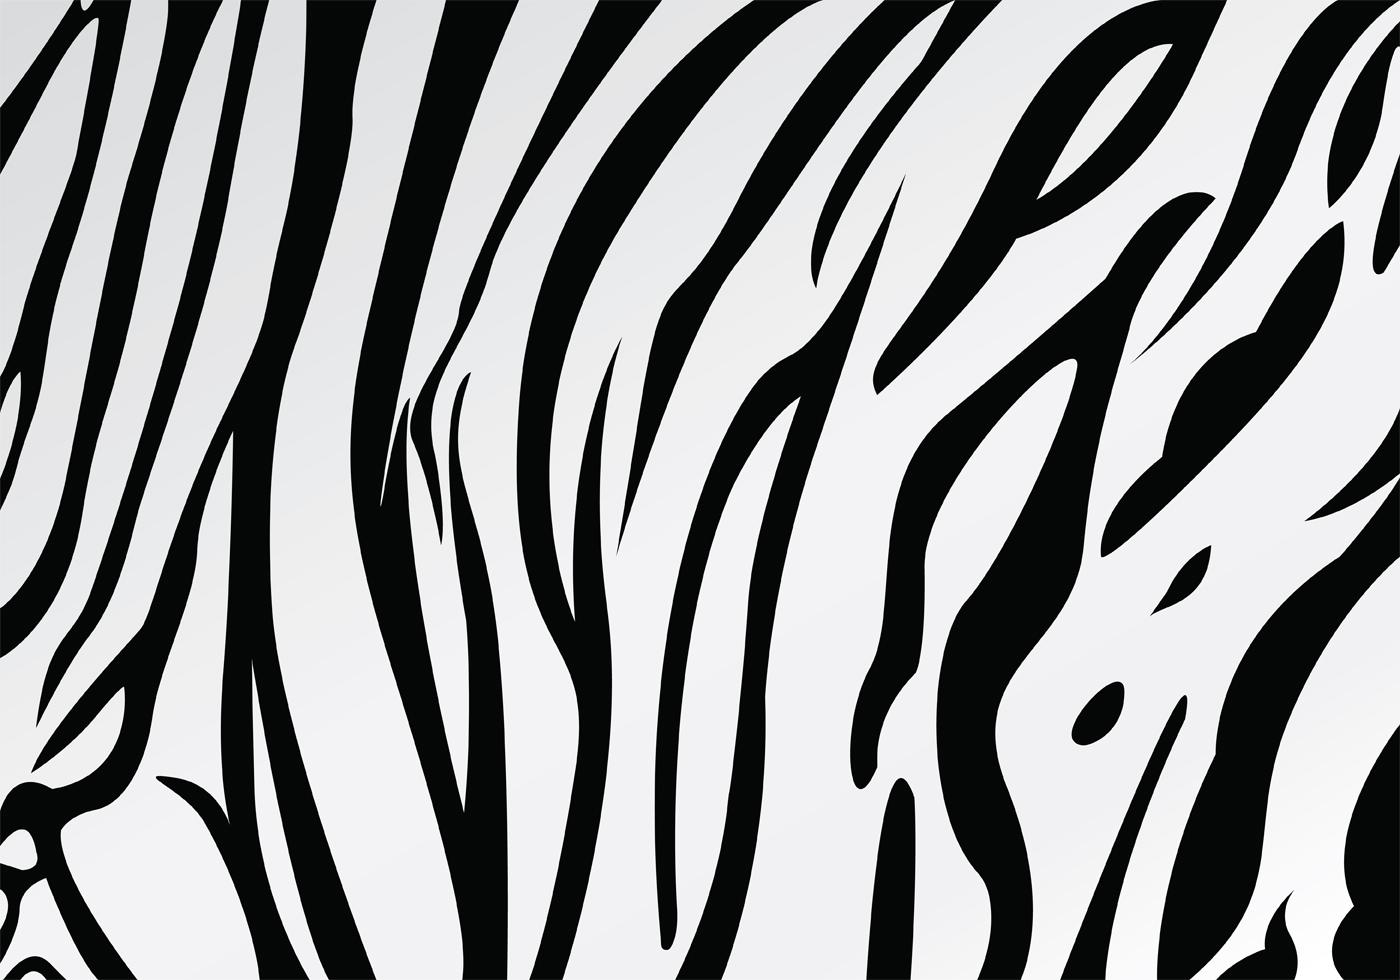 White tiger stripe pattern vector download free vector - Tiger stripes black and white ...